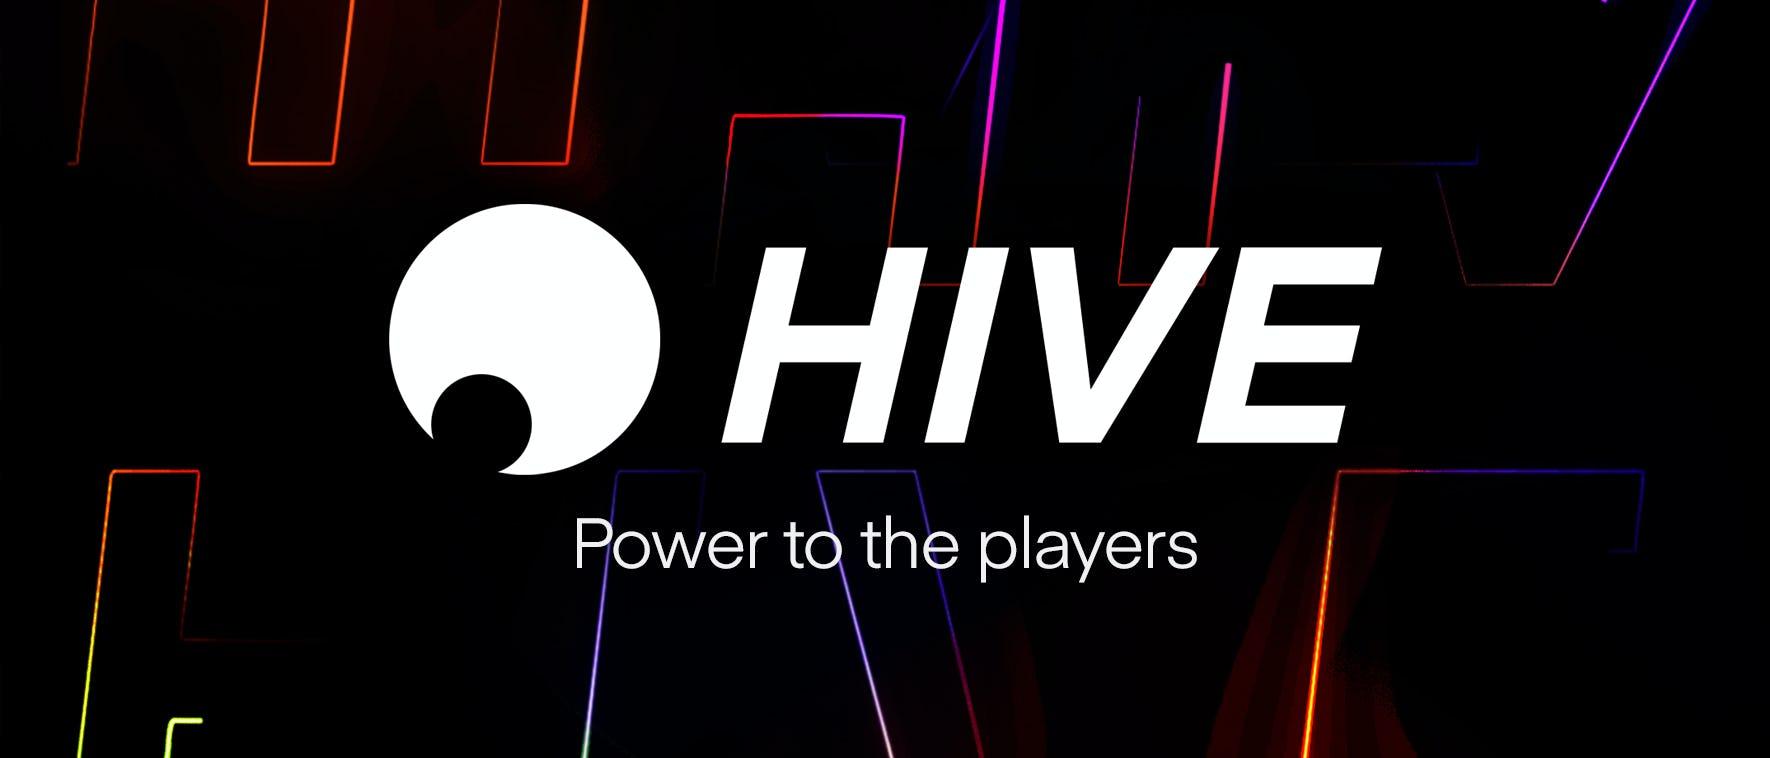 Shadow Hive : reprenez le pouvoir !